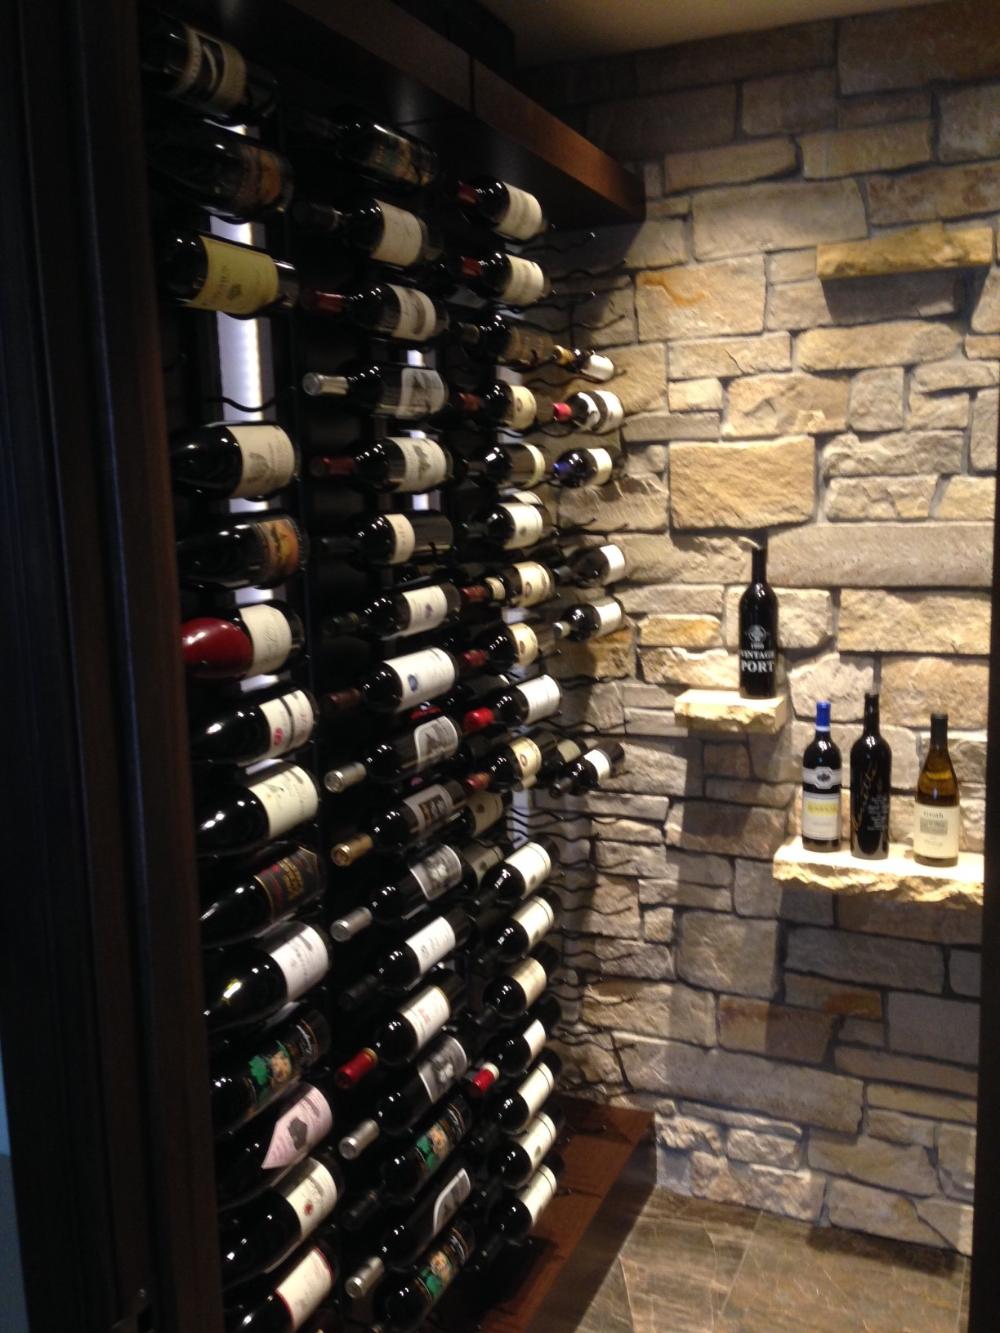 Contemporary Wine Cellar Design Ideas Wineracks Com In 2020 Wine Cellar Design Wine Cellar Racks Home Wine Cellars